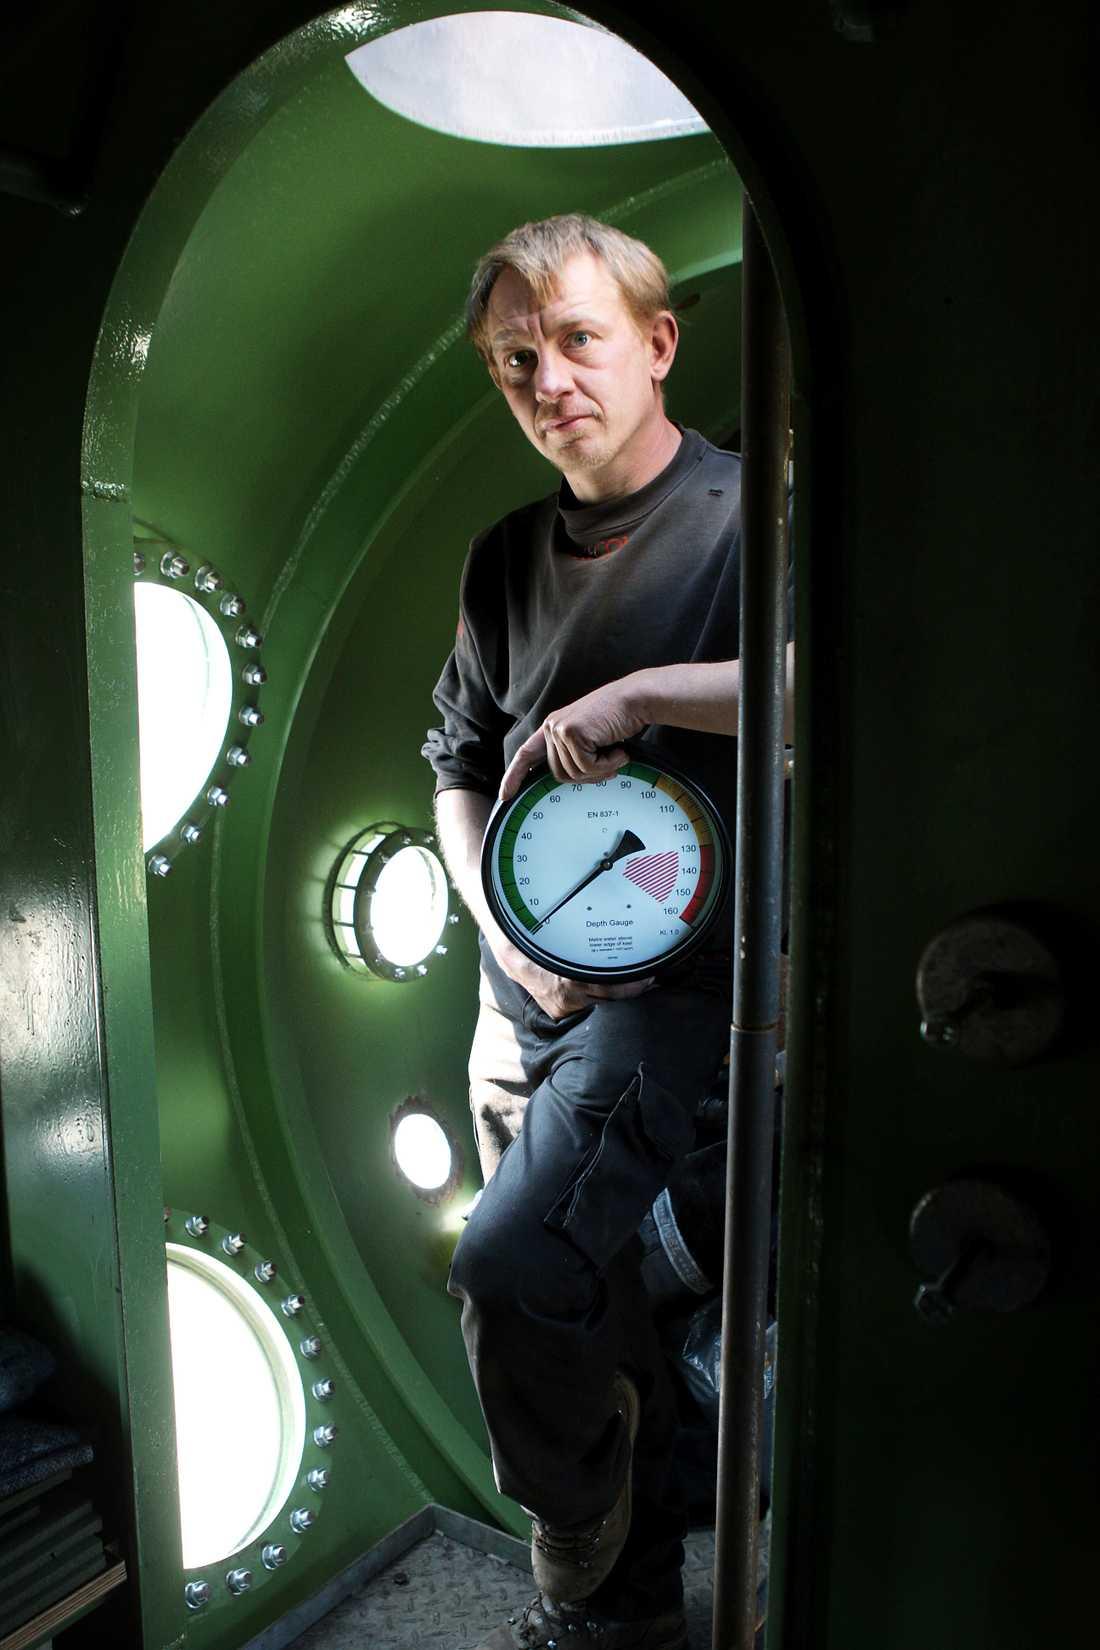 Peter Madsen ombord på sin ubåt. Arkiv 2008.